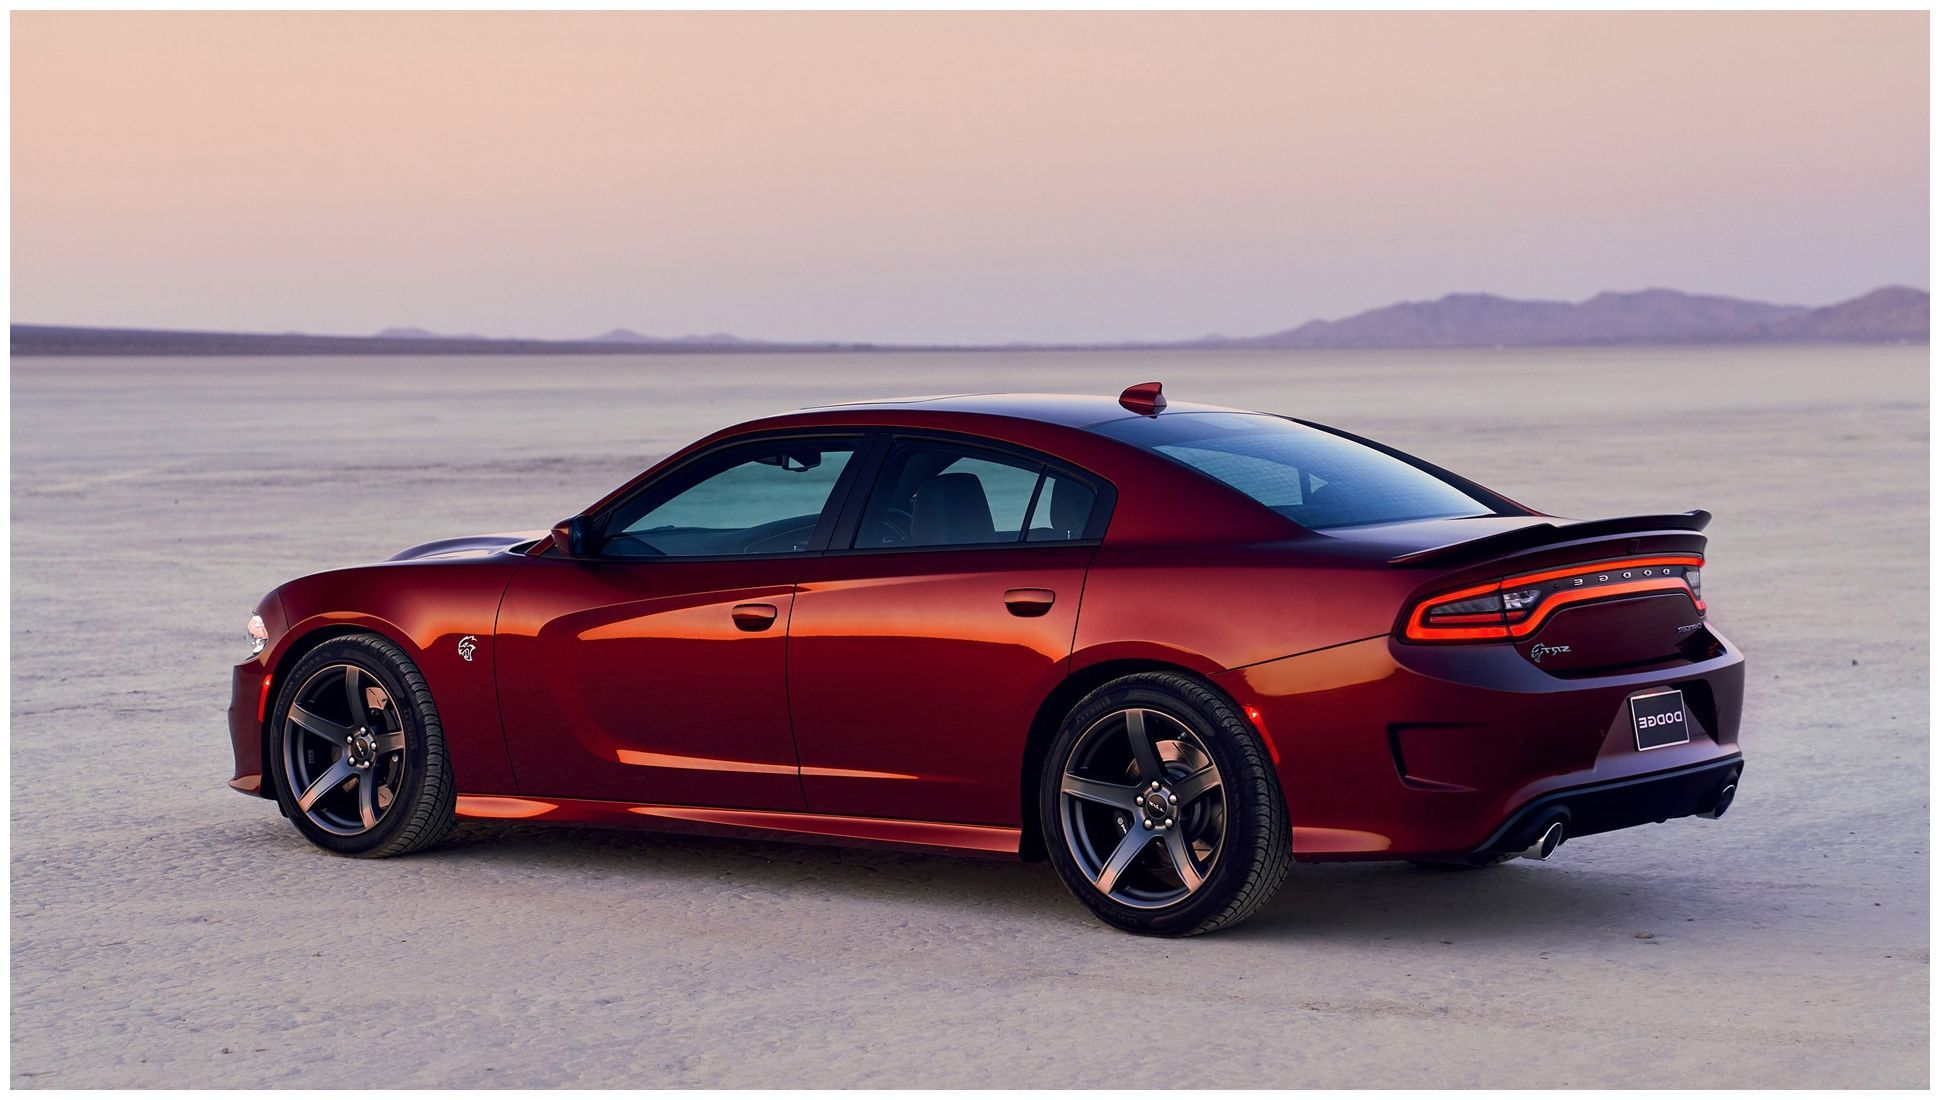 2020 Dodge Charger SRT8 | Dodge charger srt, Charger srt8 ...